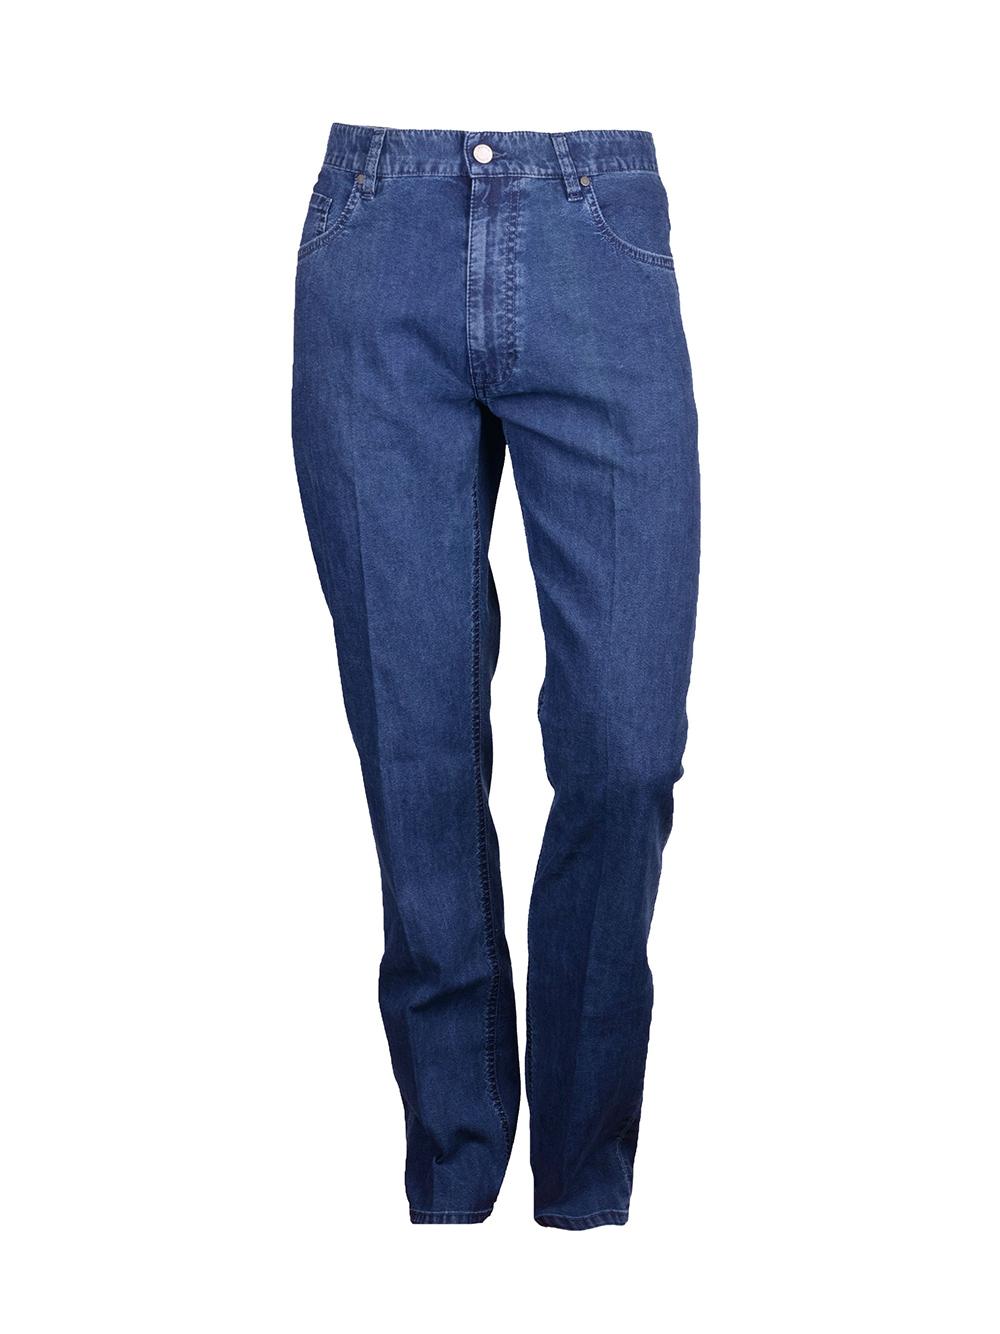 ZEGNA Παντελόνι Jeans VS714ZZ507 ΜΠΛΕ